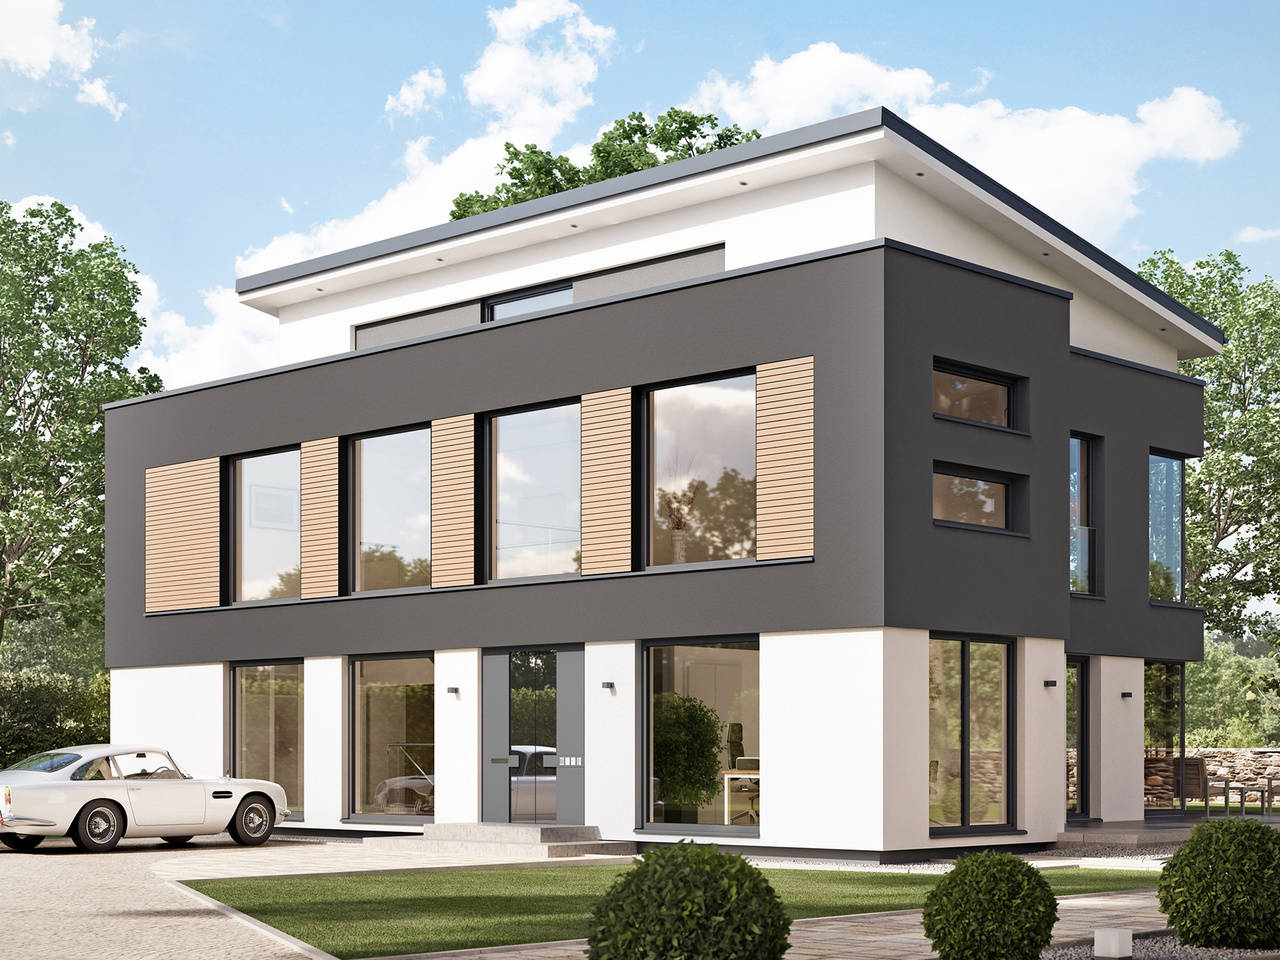 Concept-M Wuppertal Mod-Classic, Ansicht 1